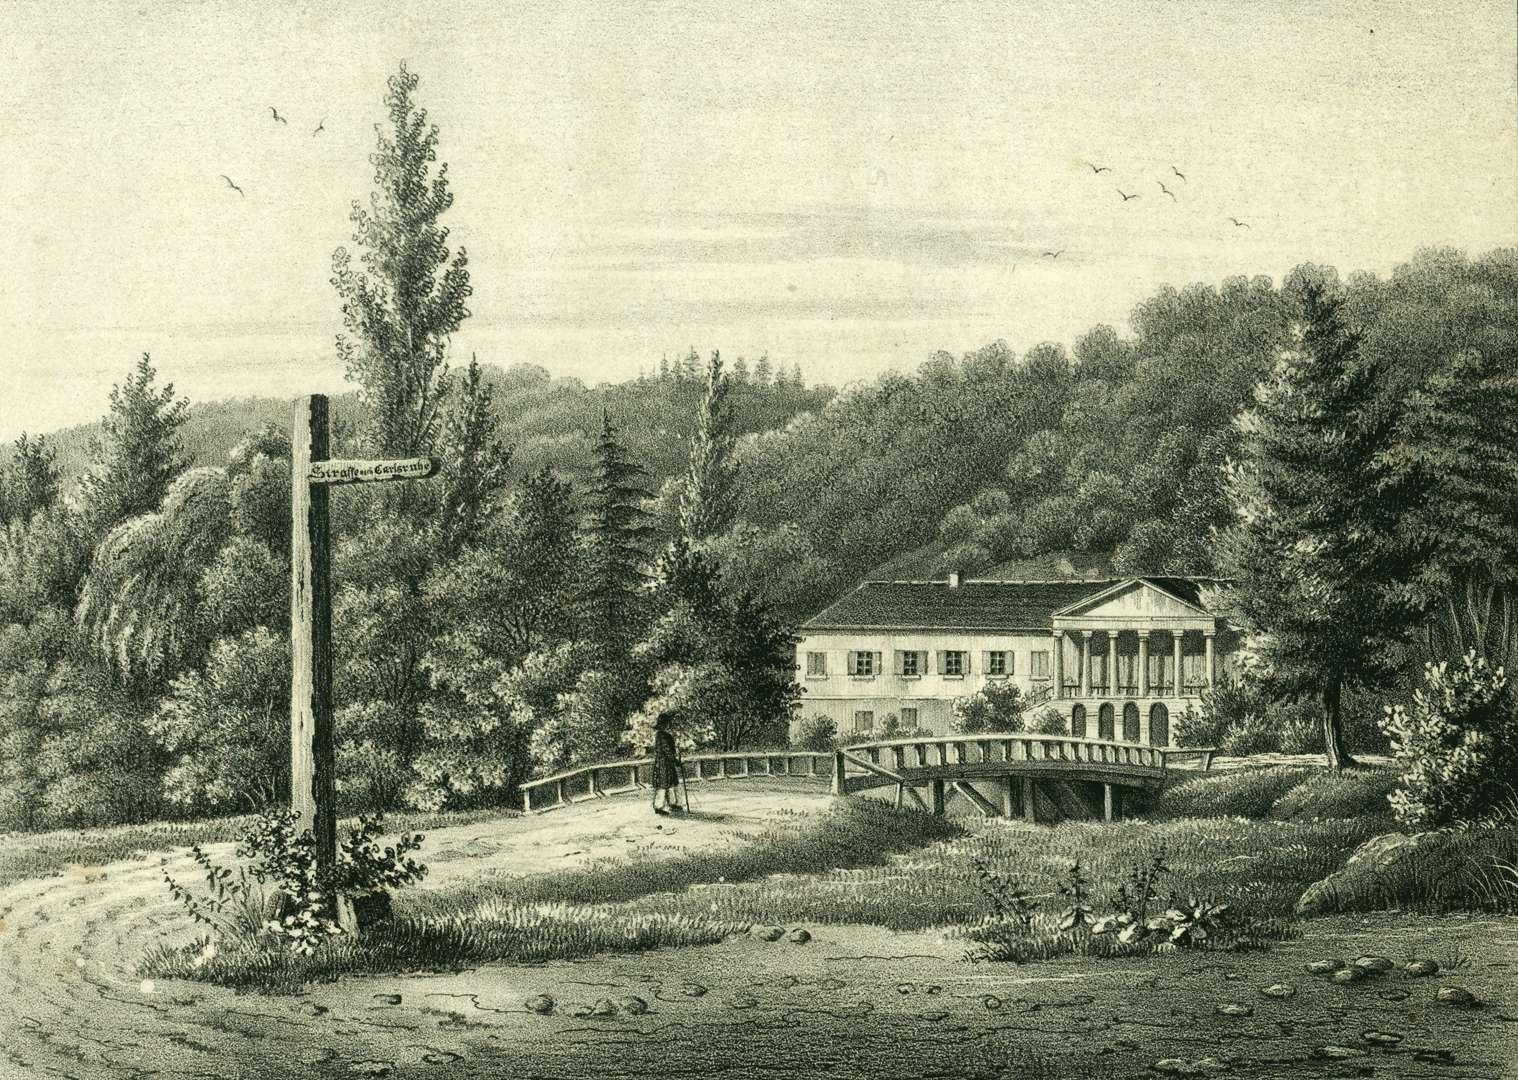 Schloß Rothenfels, Bild 1